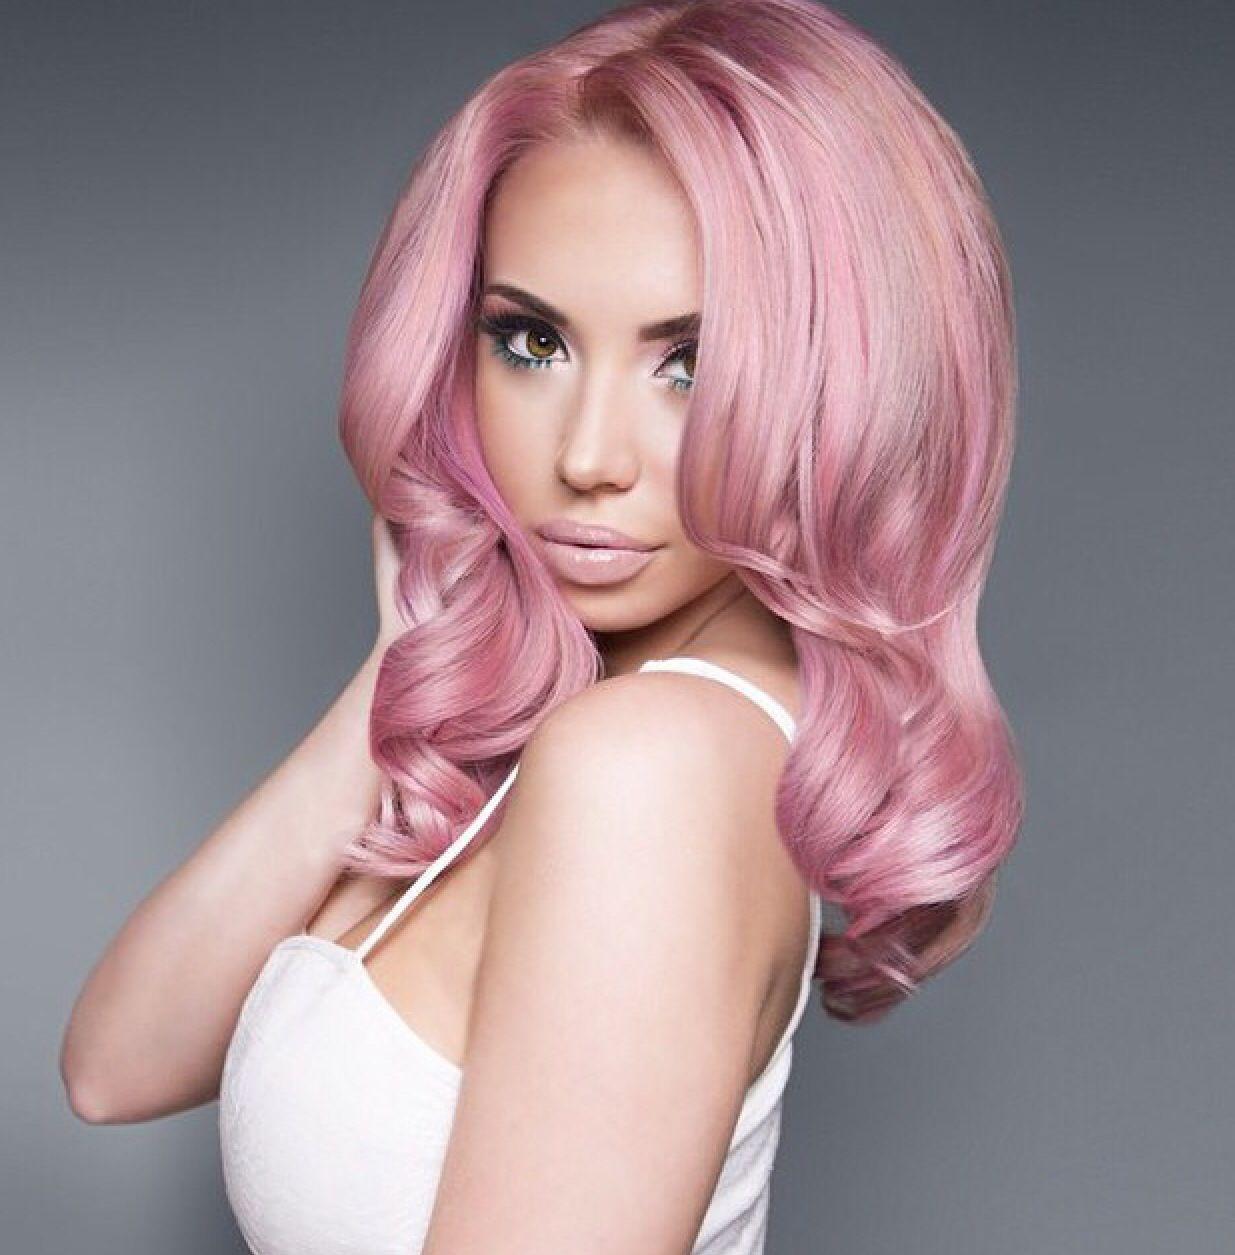 Human Hair Wigs For White Women